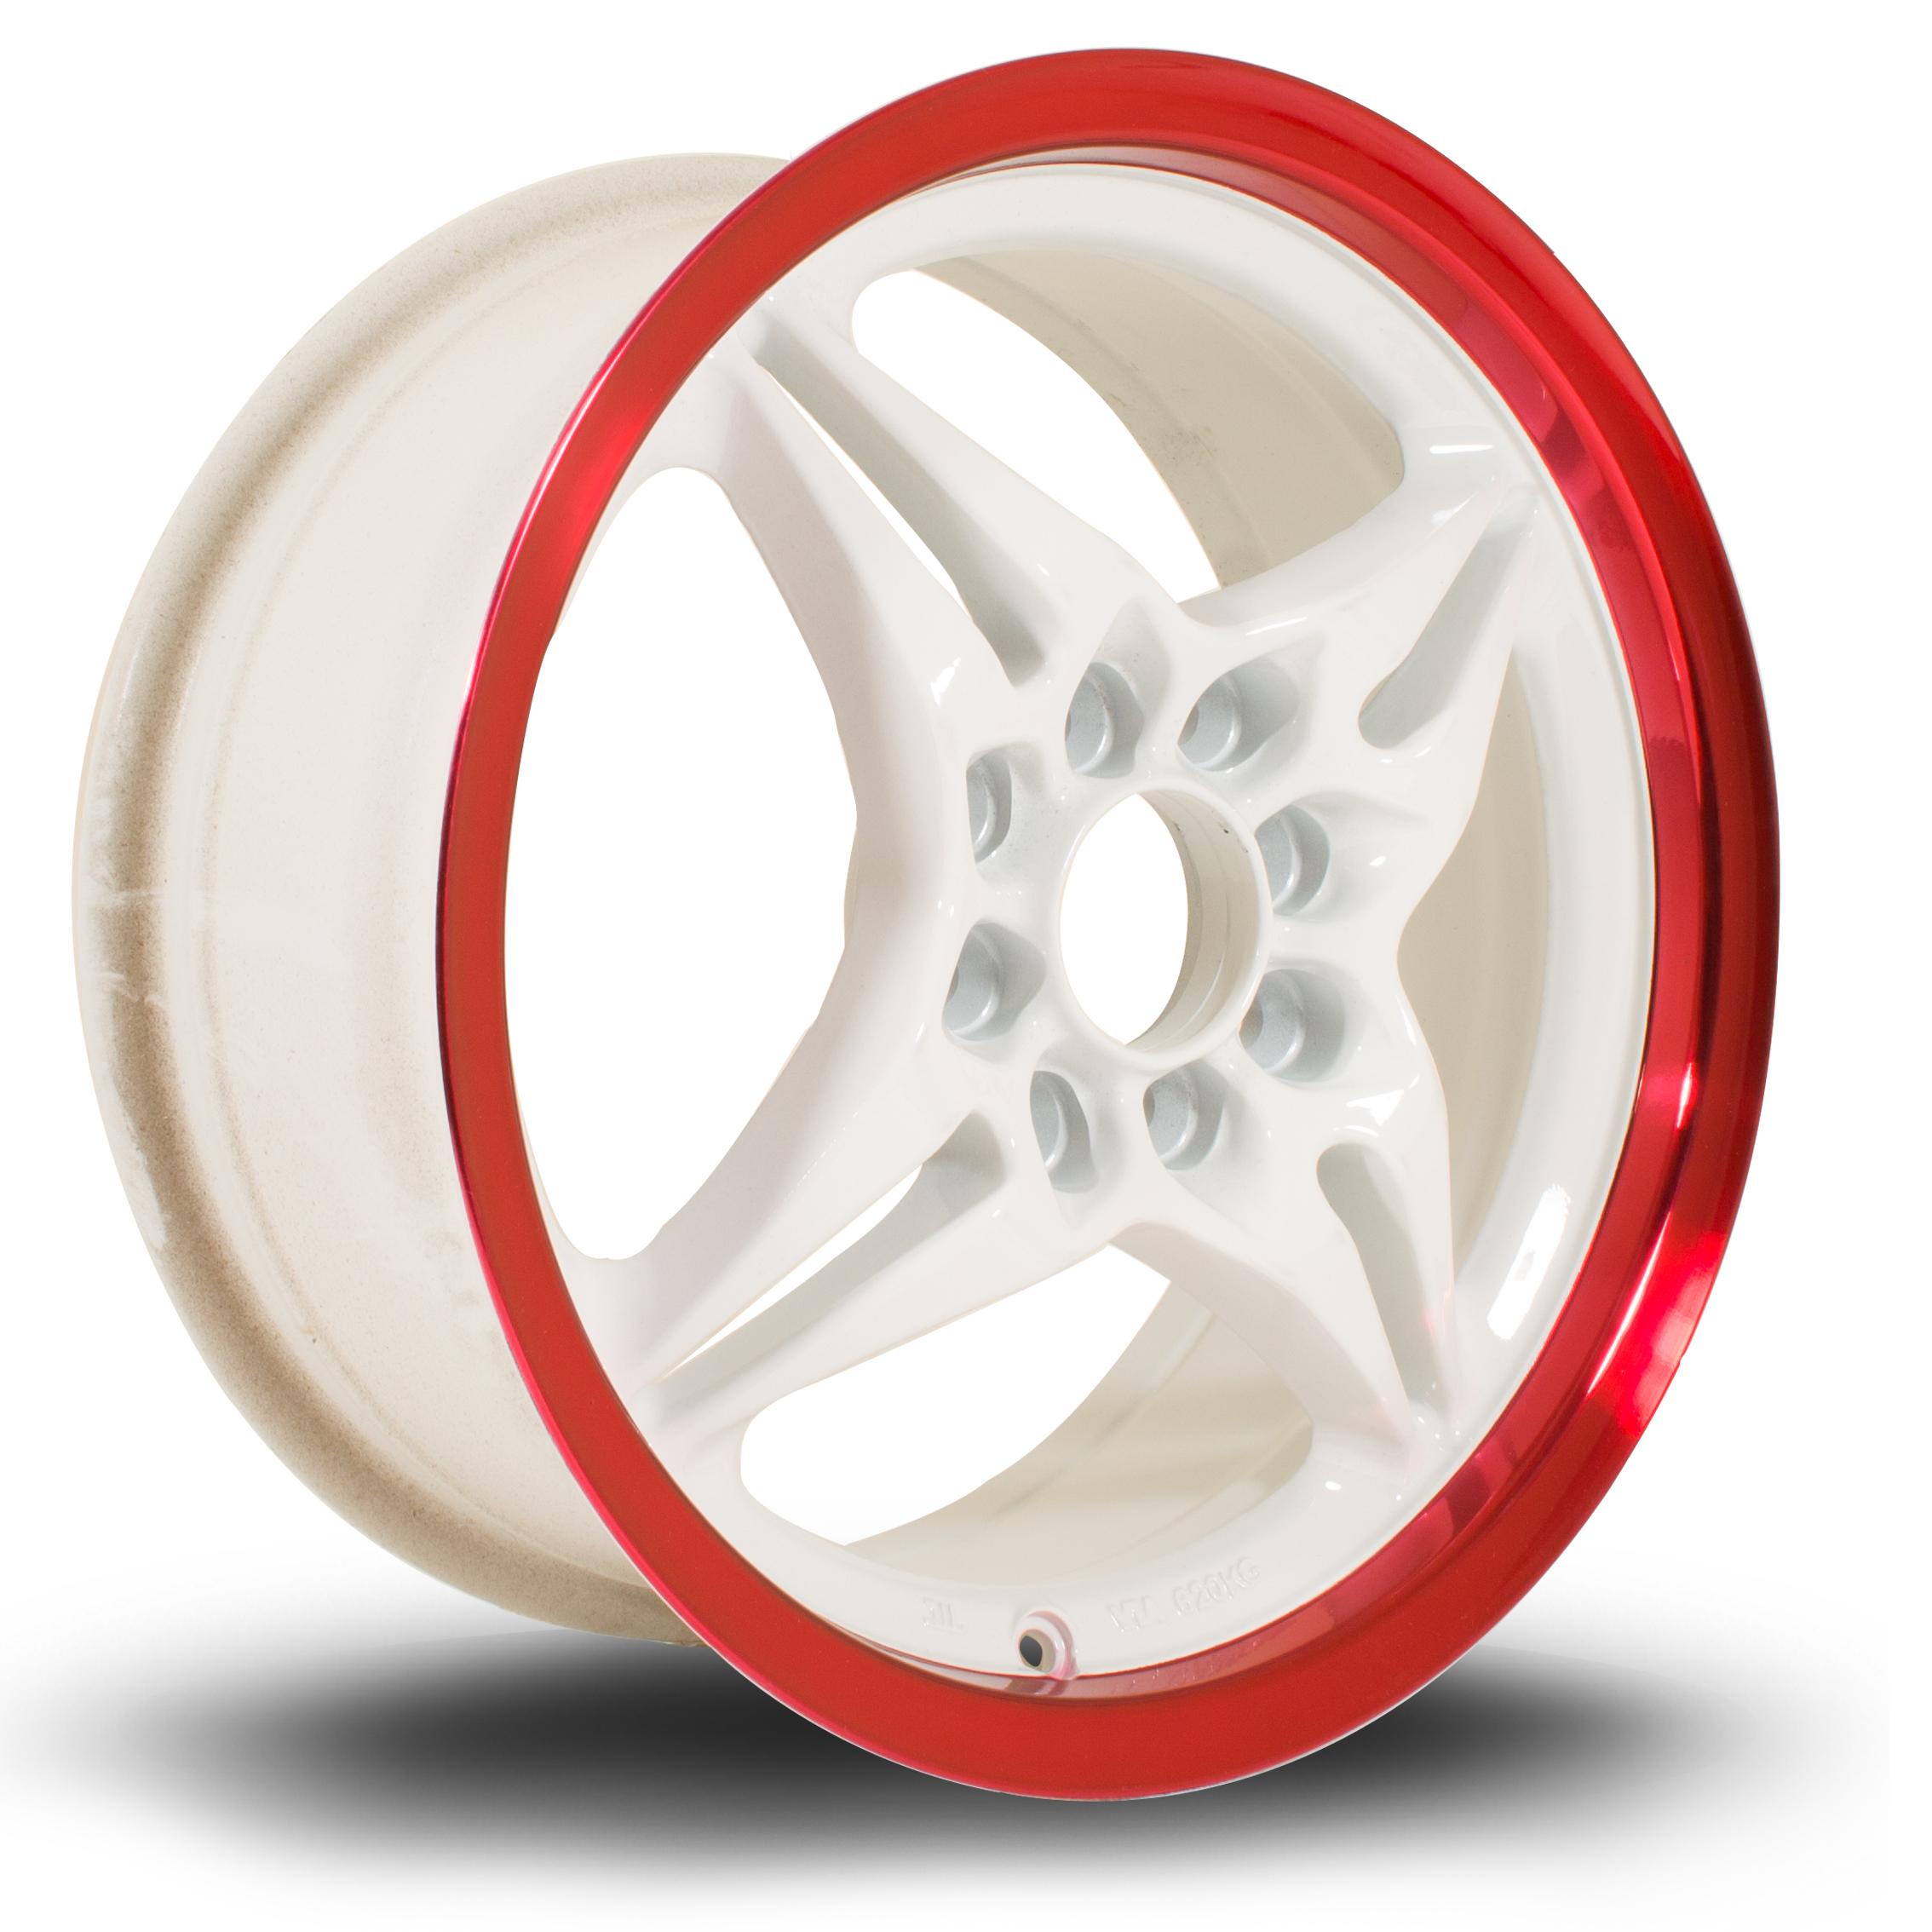 ROTA AUTOX 6,5x15 4x100/114,3 ET40 WHITE RED LIP